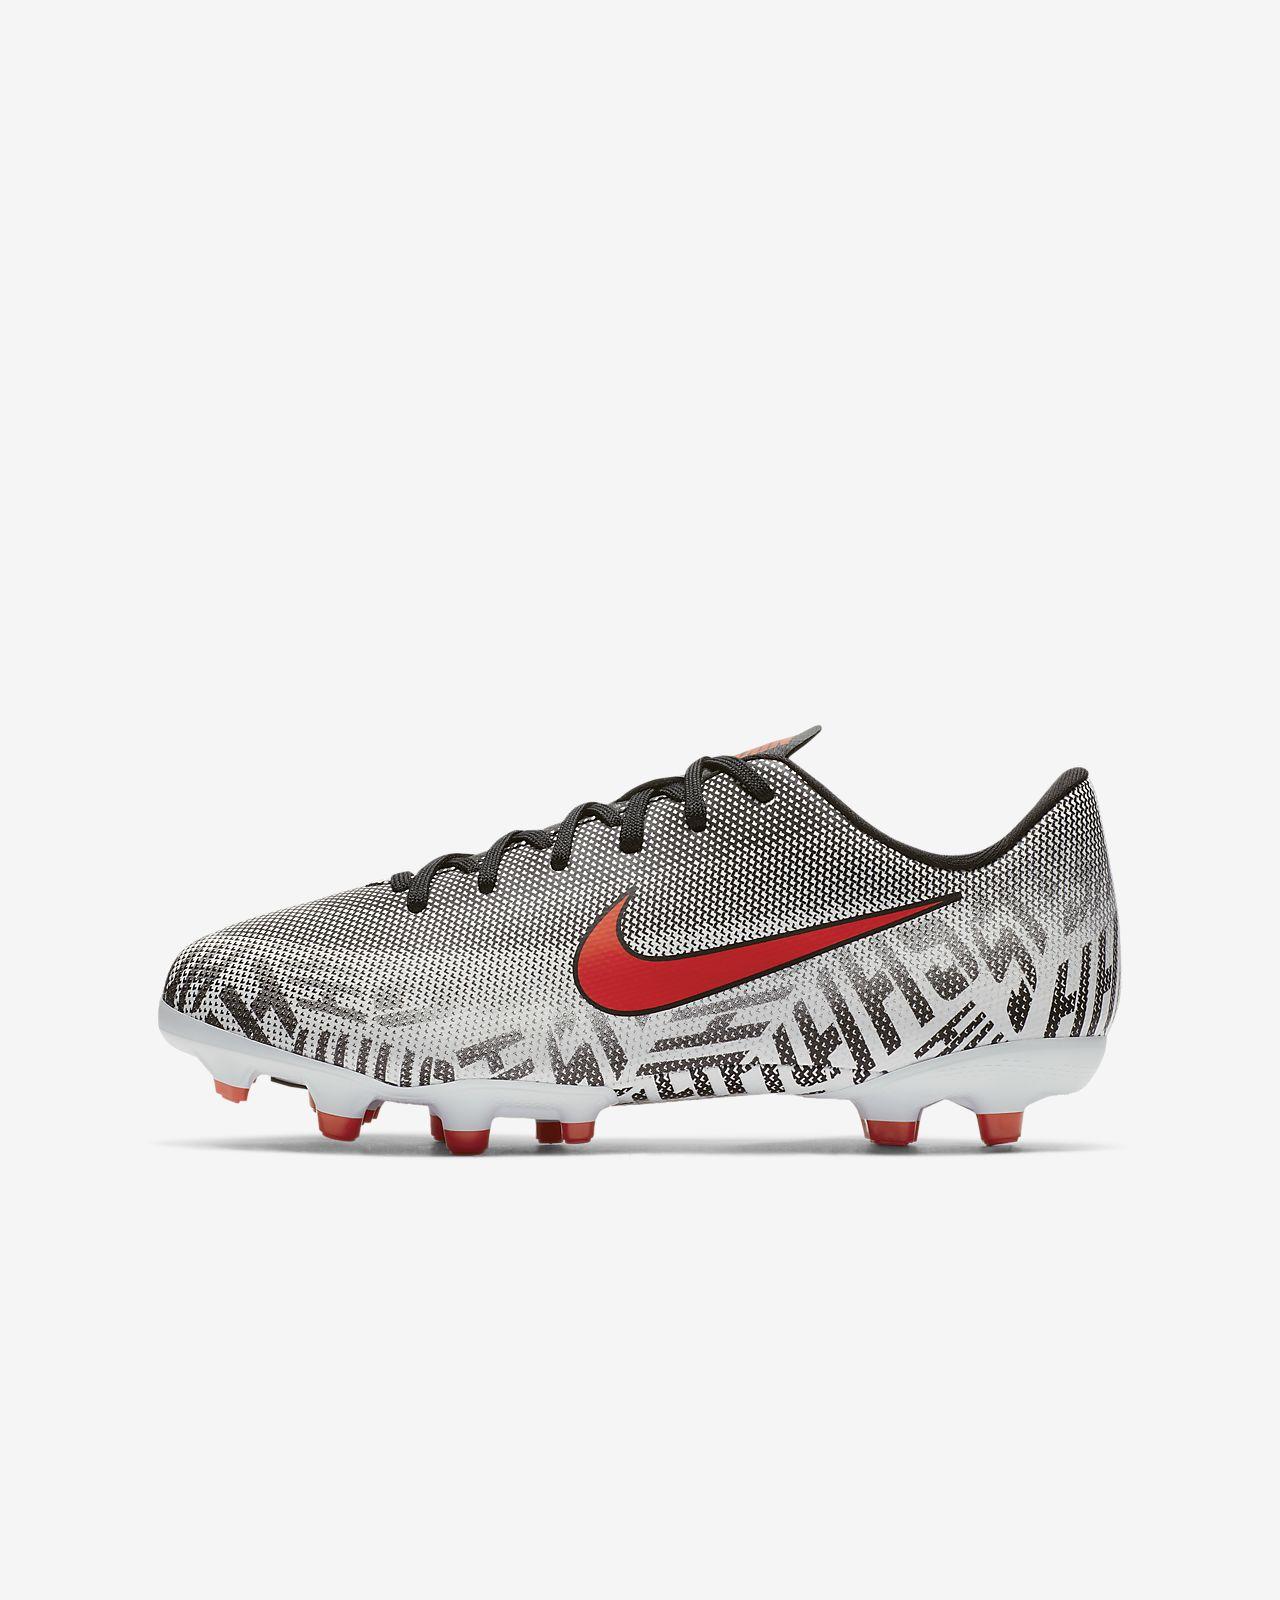 Scarpa da calcio multiterreno Nike Jr. Mercurial Vapor XII Academy Neymar Jr - Bambini/Ragazzi